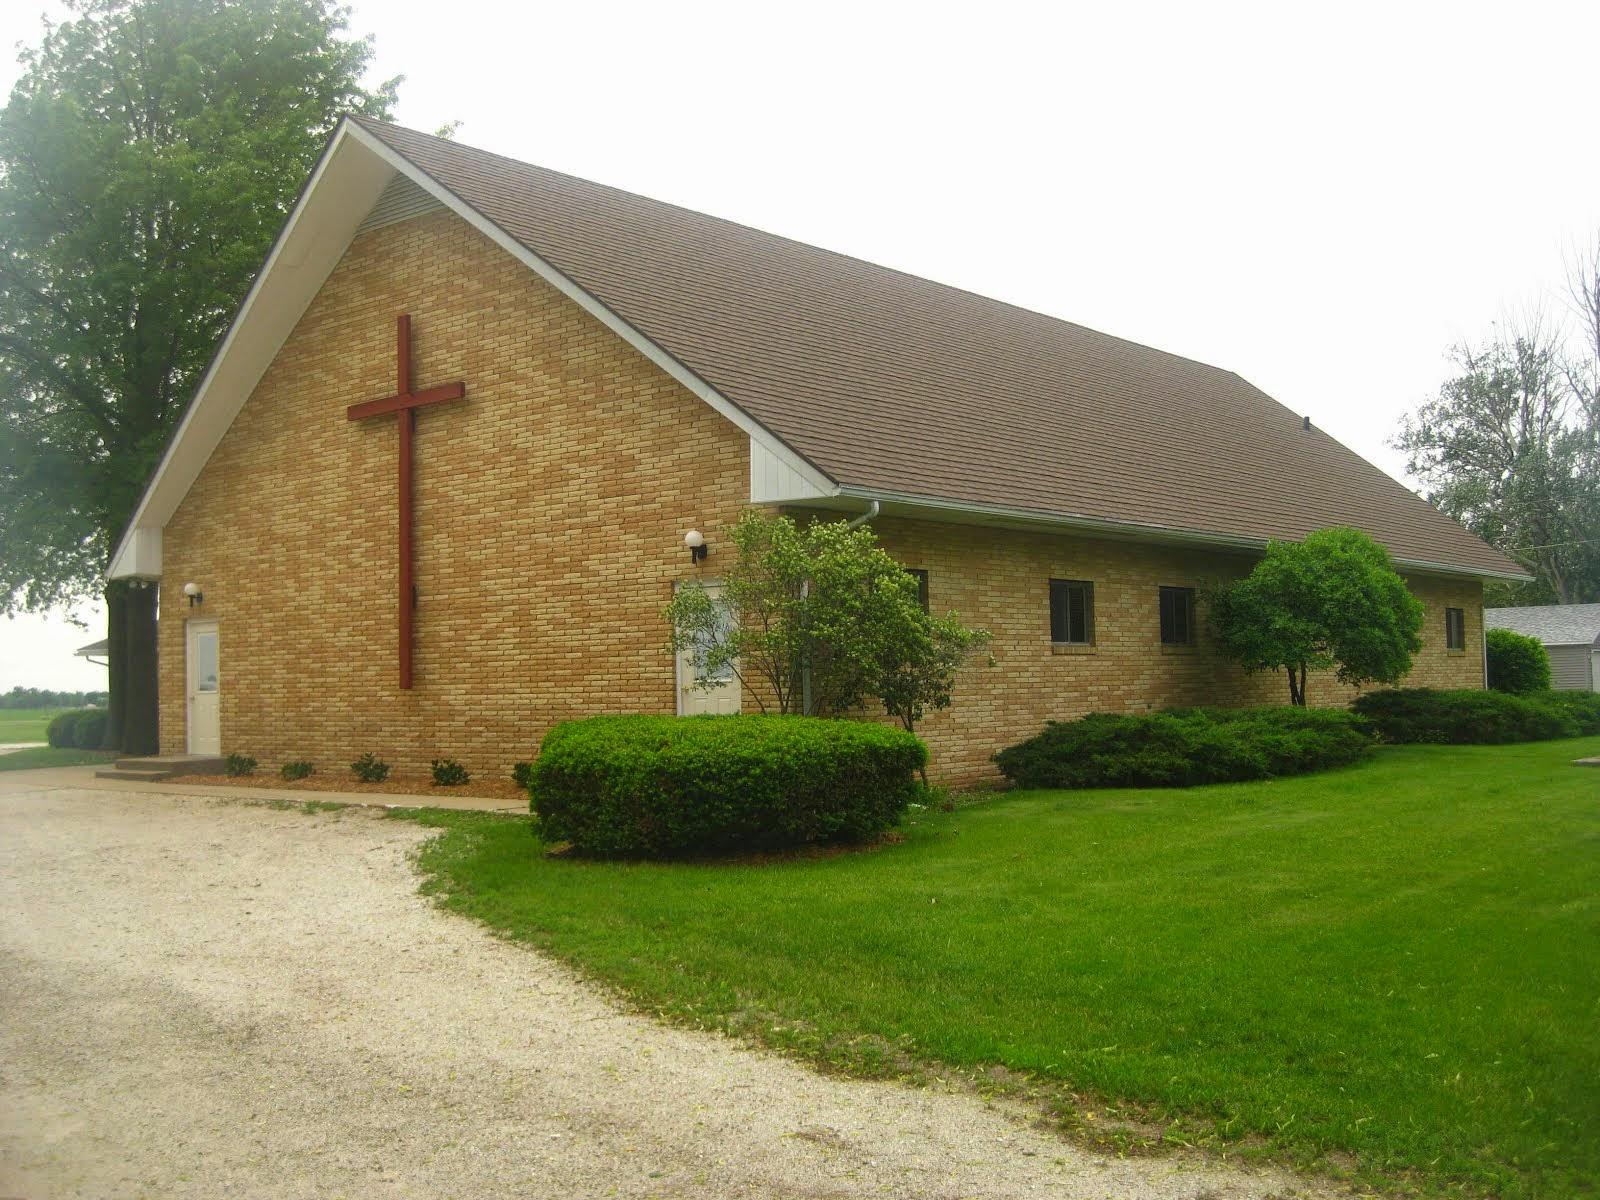 Washington Mennonite Church